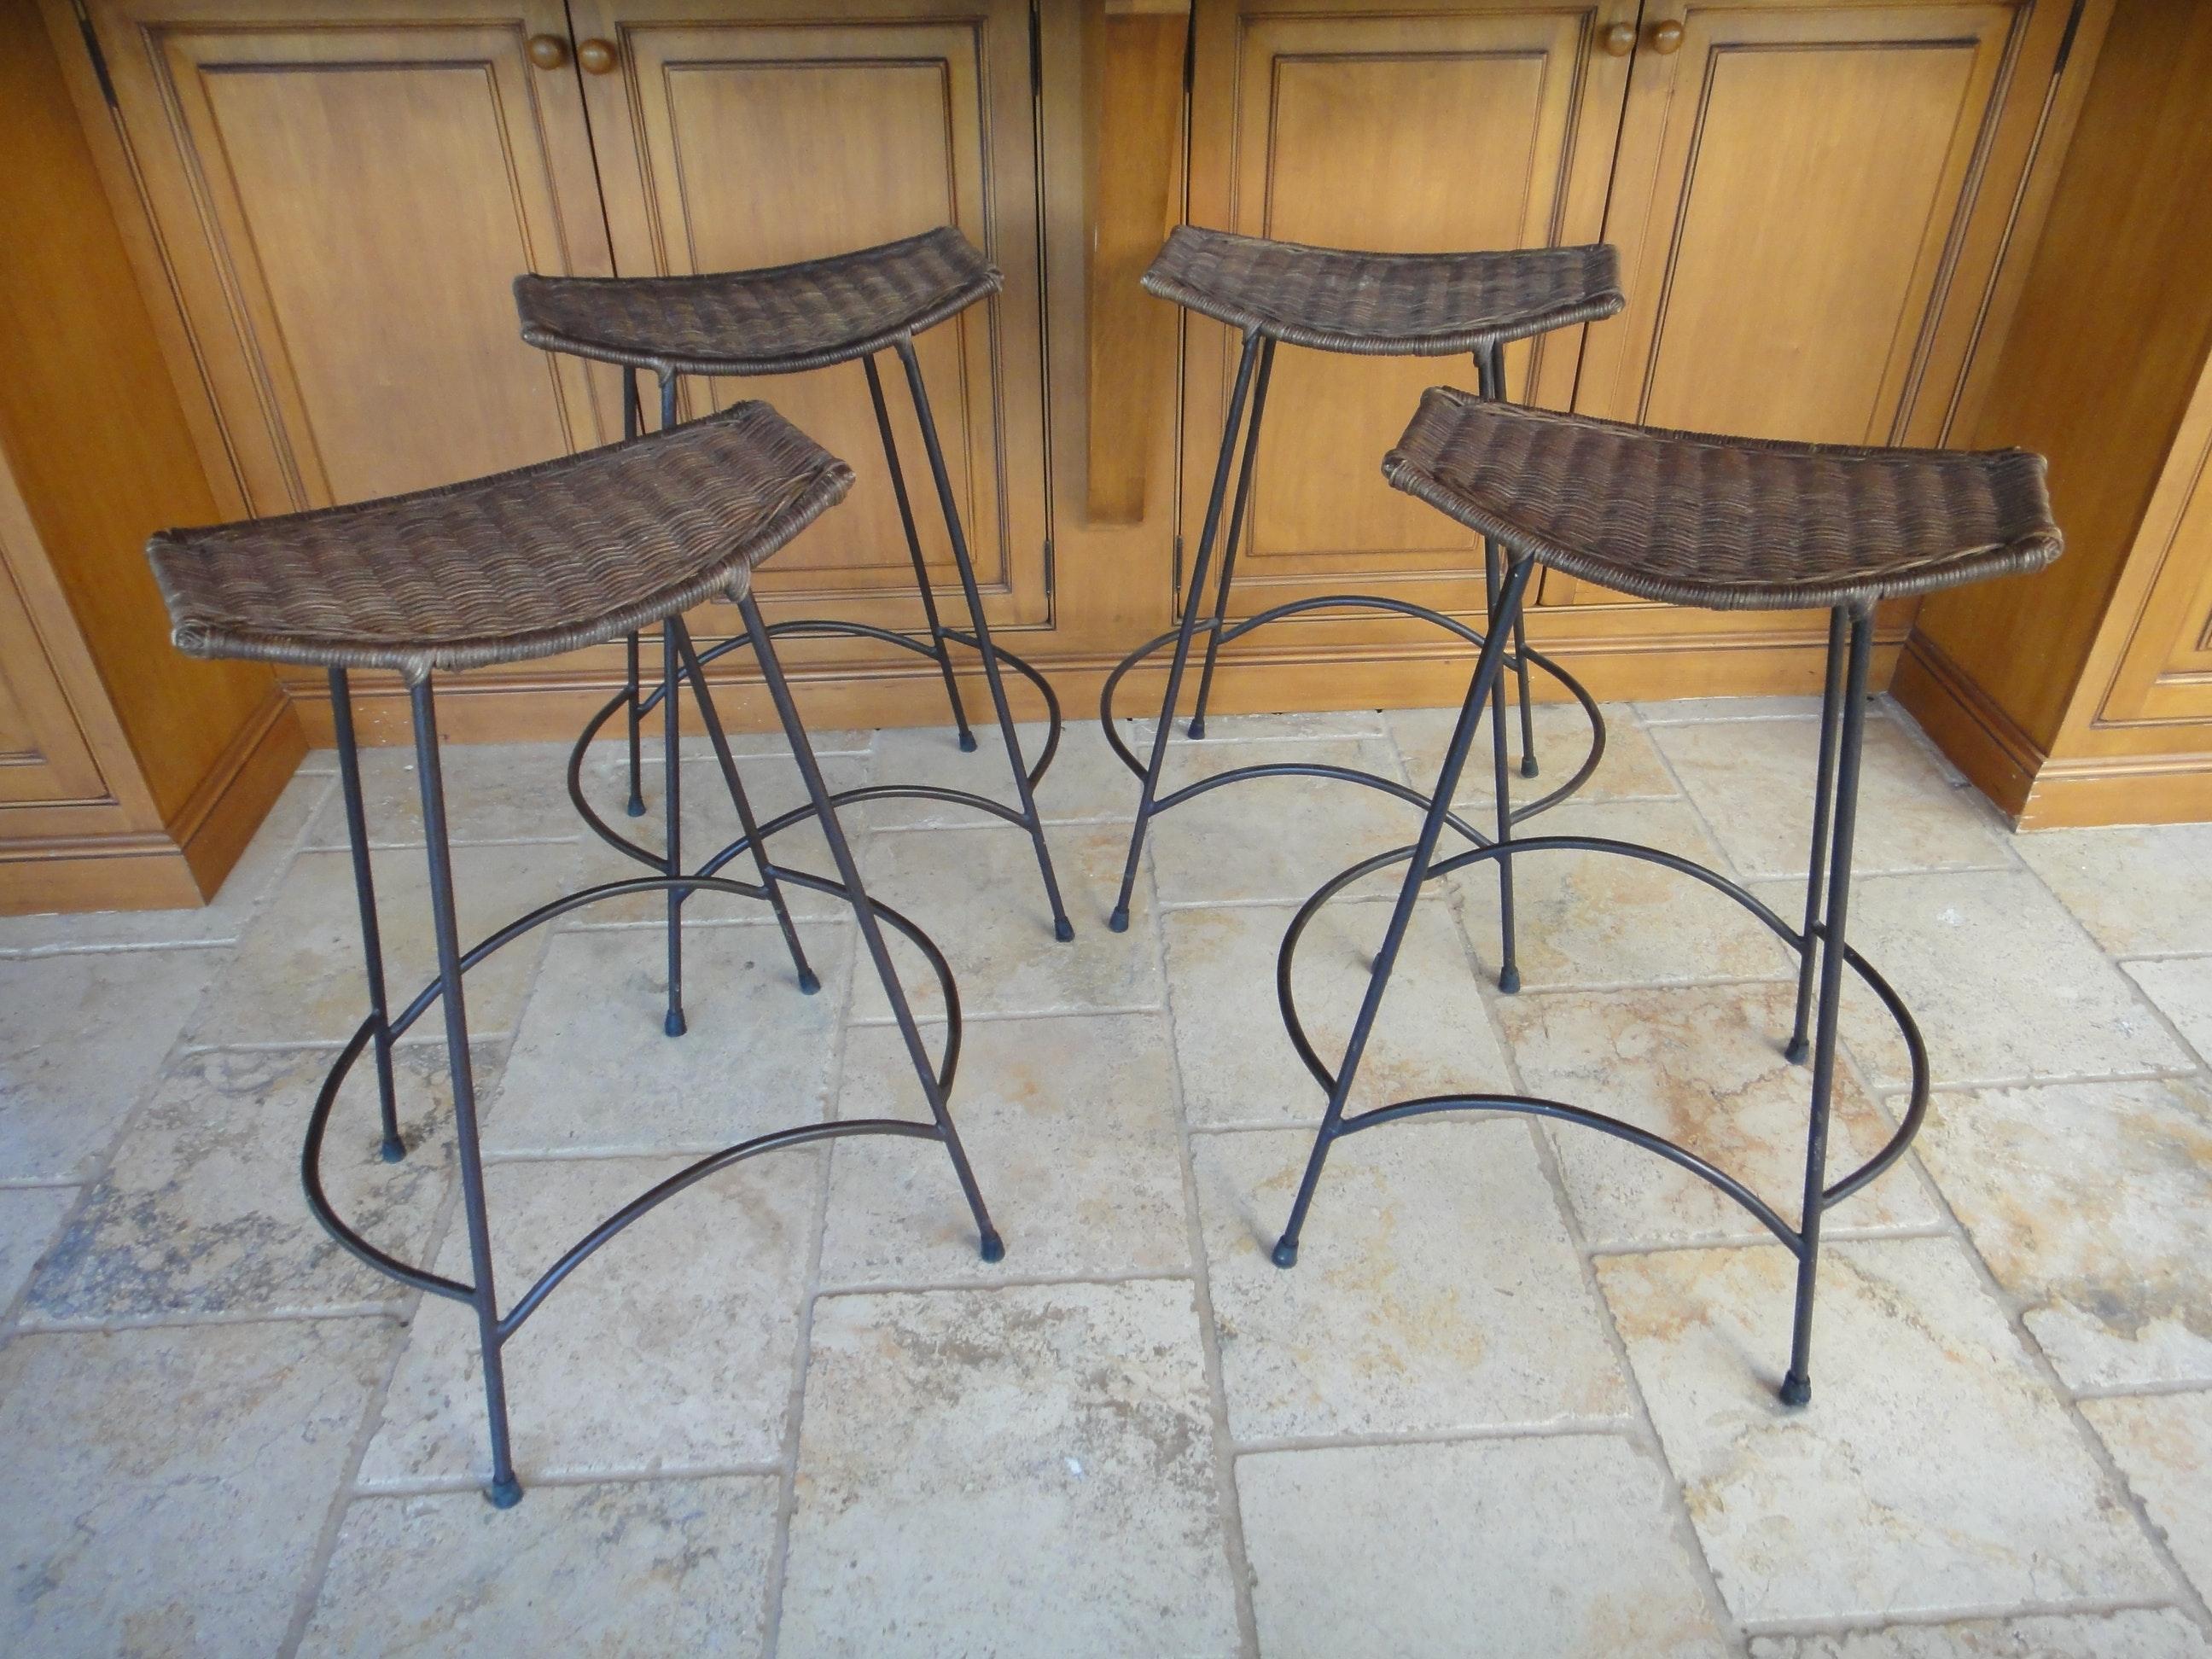 Four Vintage Wrought Iron Wicker Bar Stools Ebth